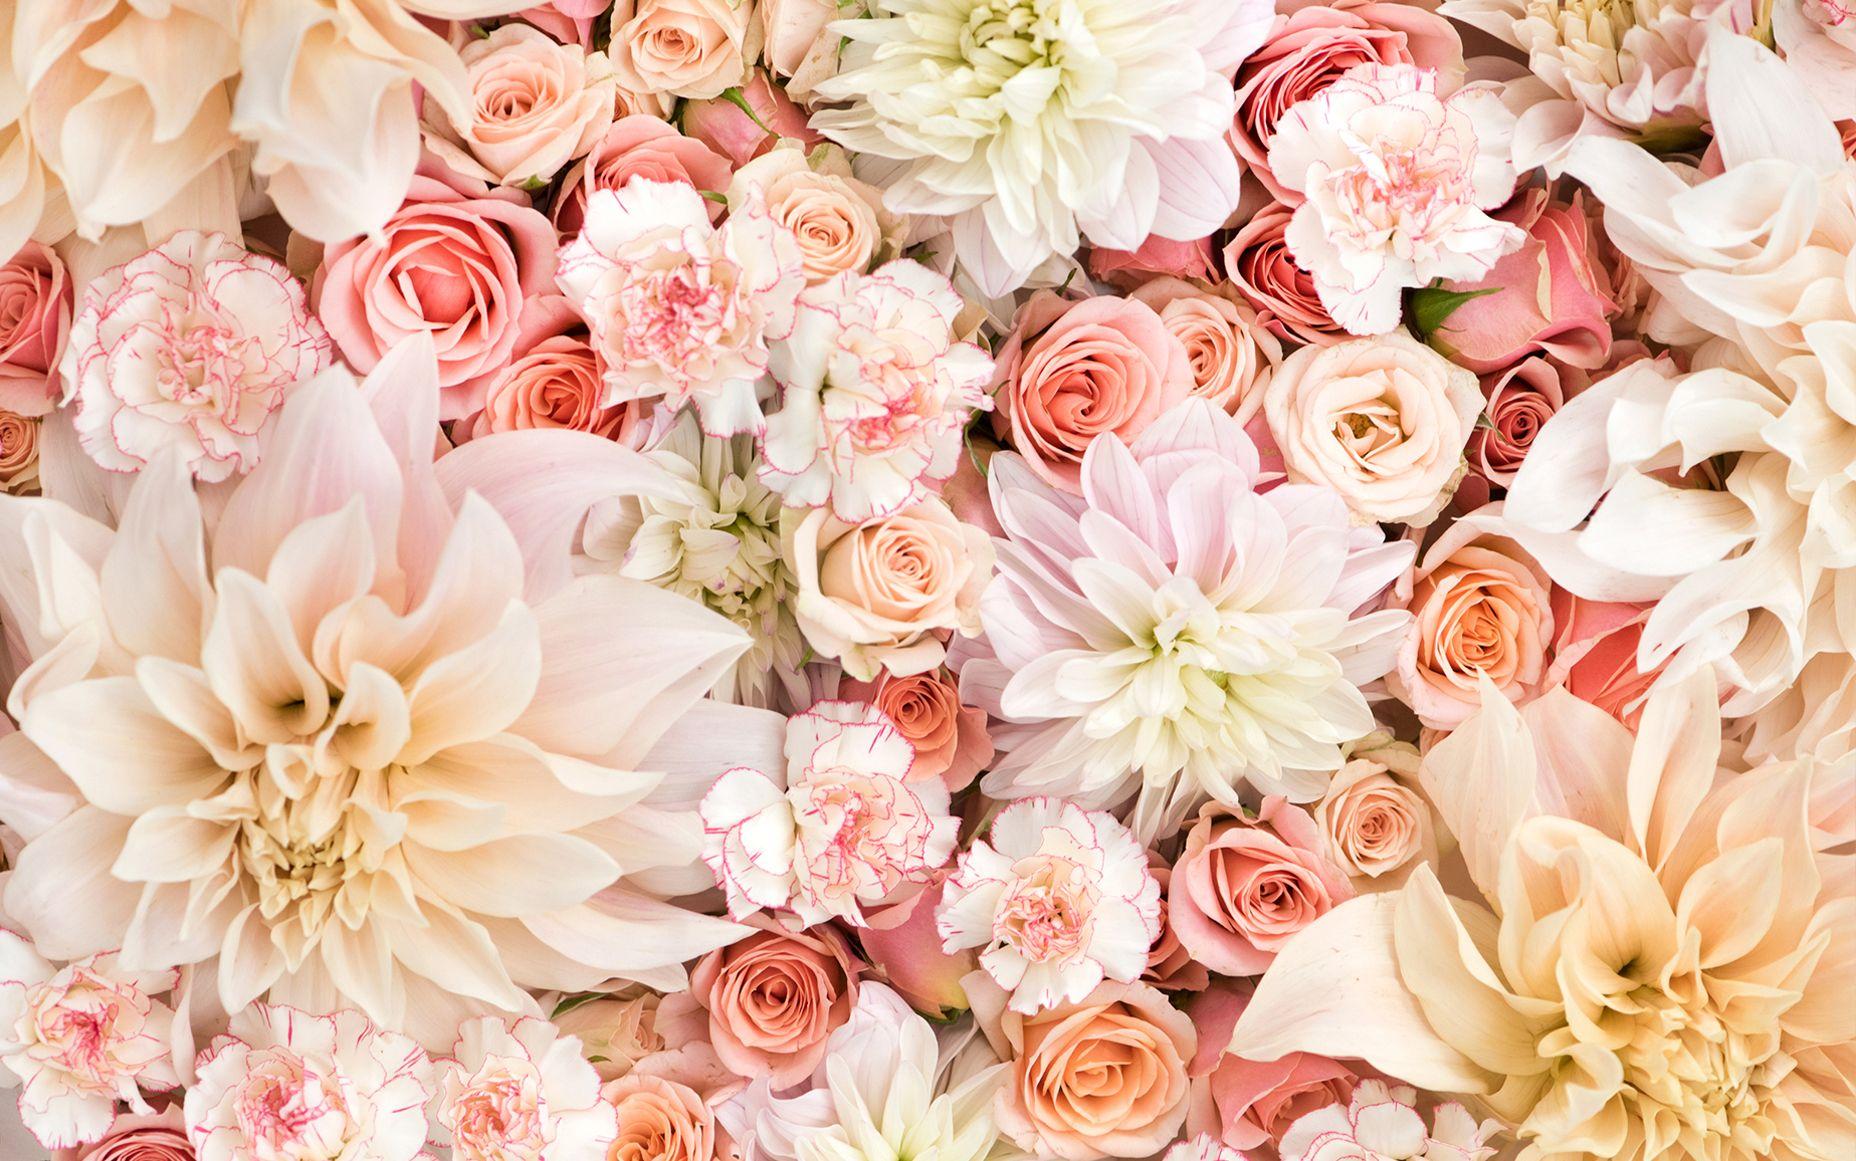 Floral Desktop Wallpapers   Top Floral Desktop Backgrounds 1856x1161